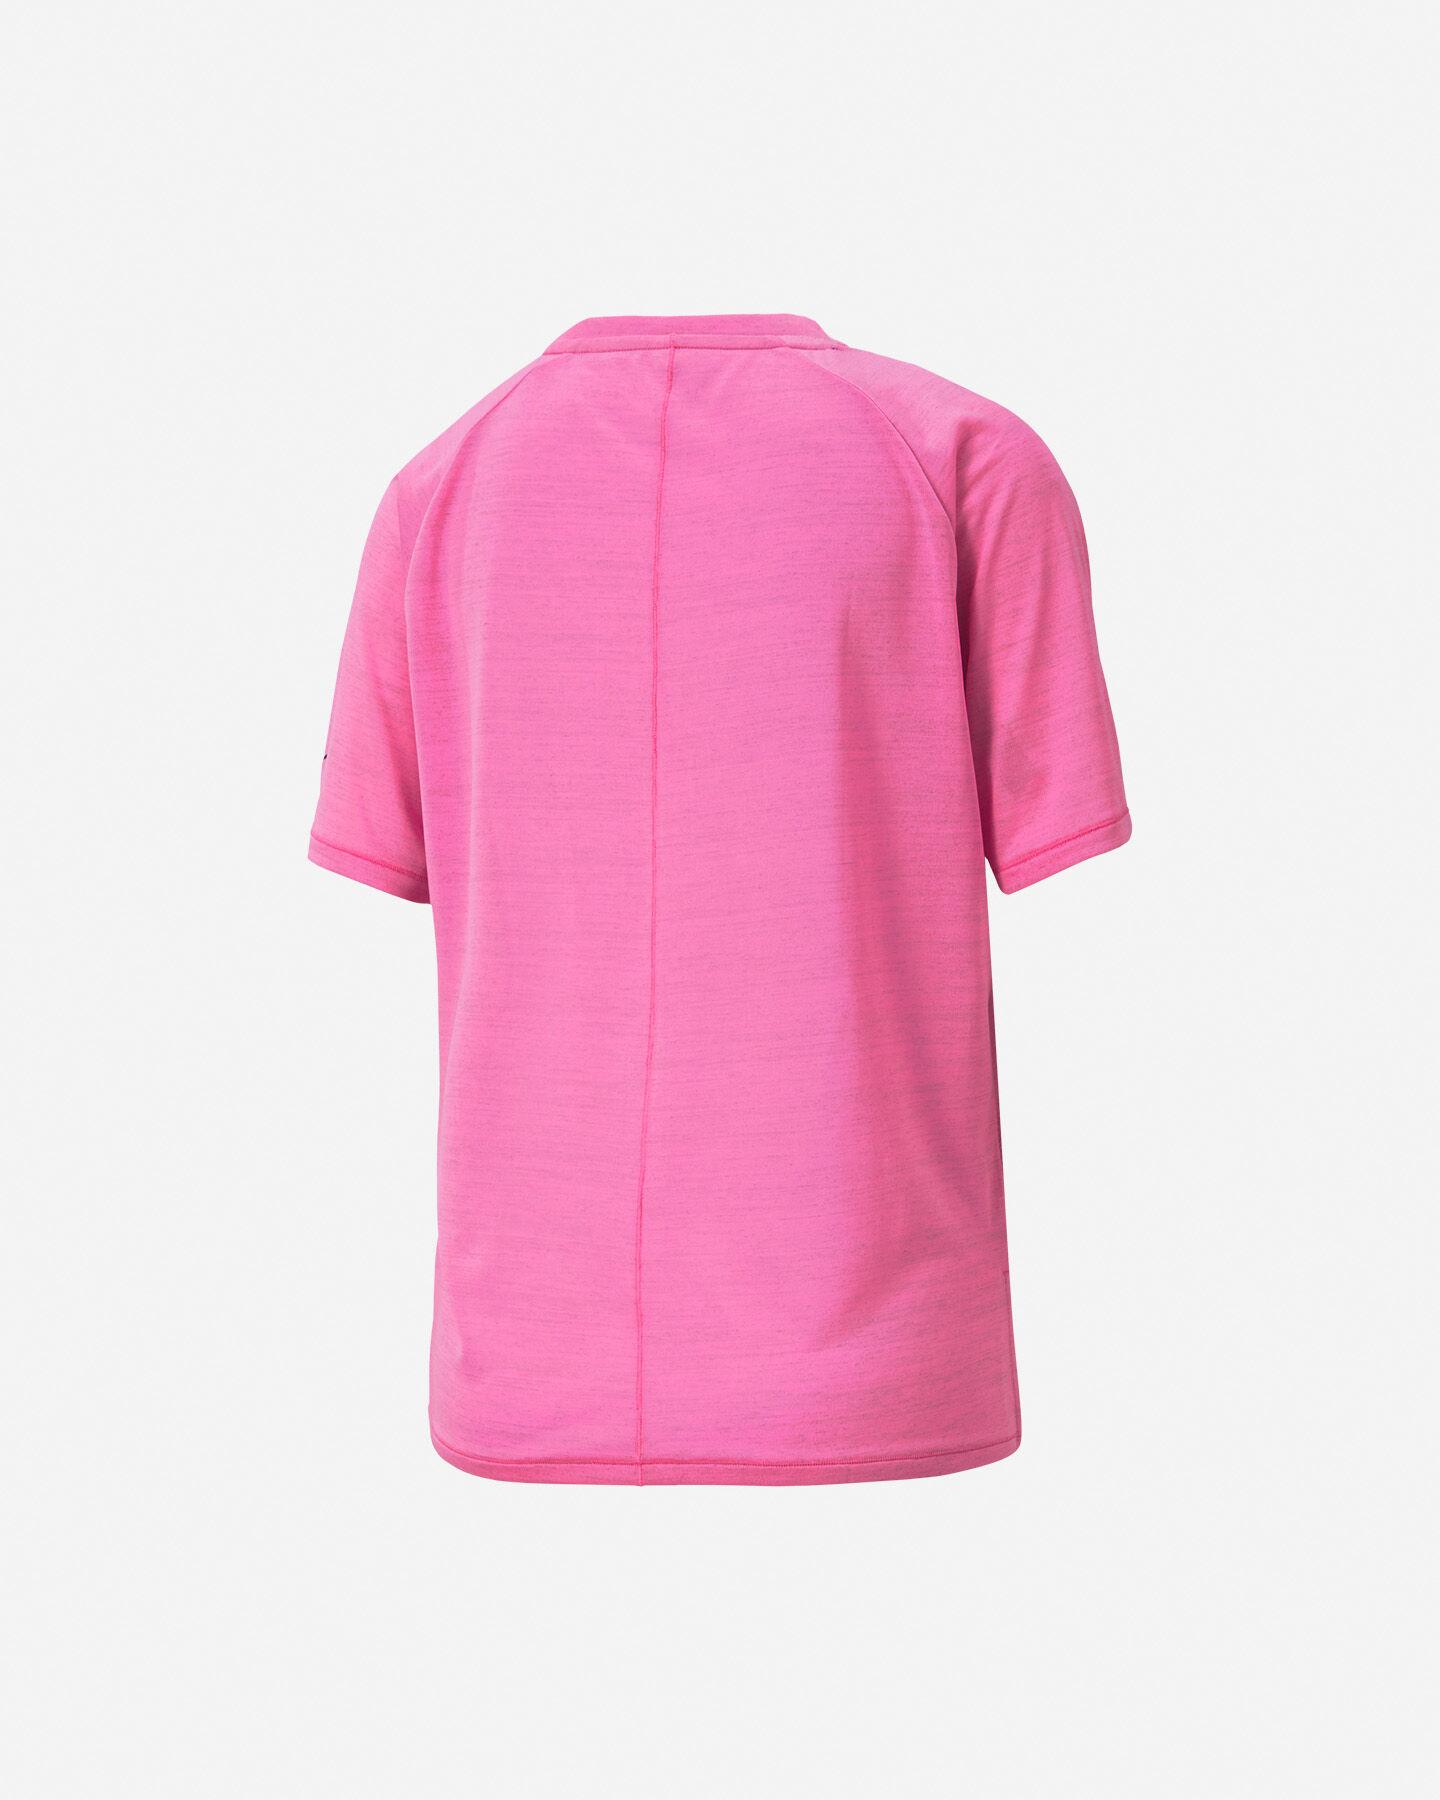 T-Shirt training PUMA DRIFIT LOGO W S5234838 scatto 1